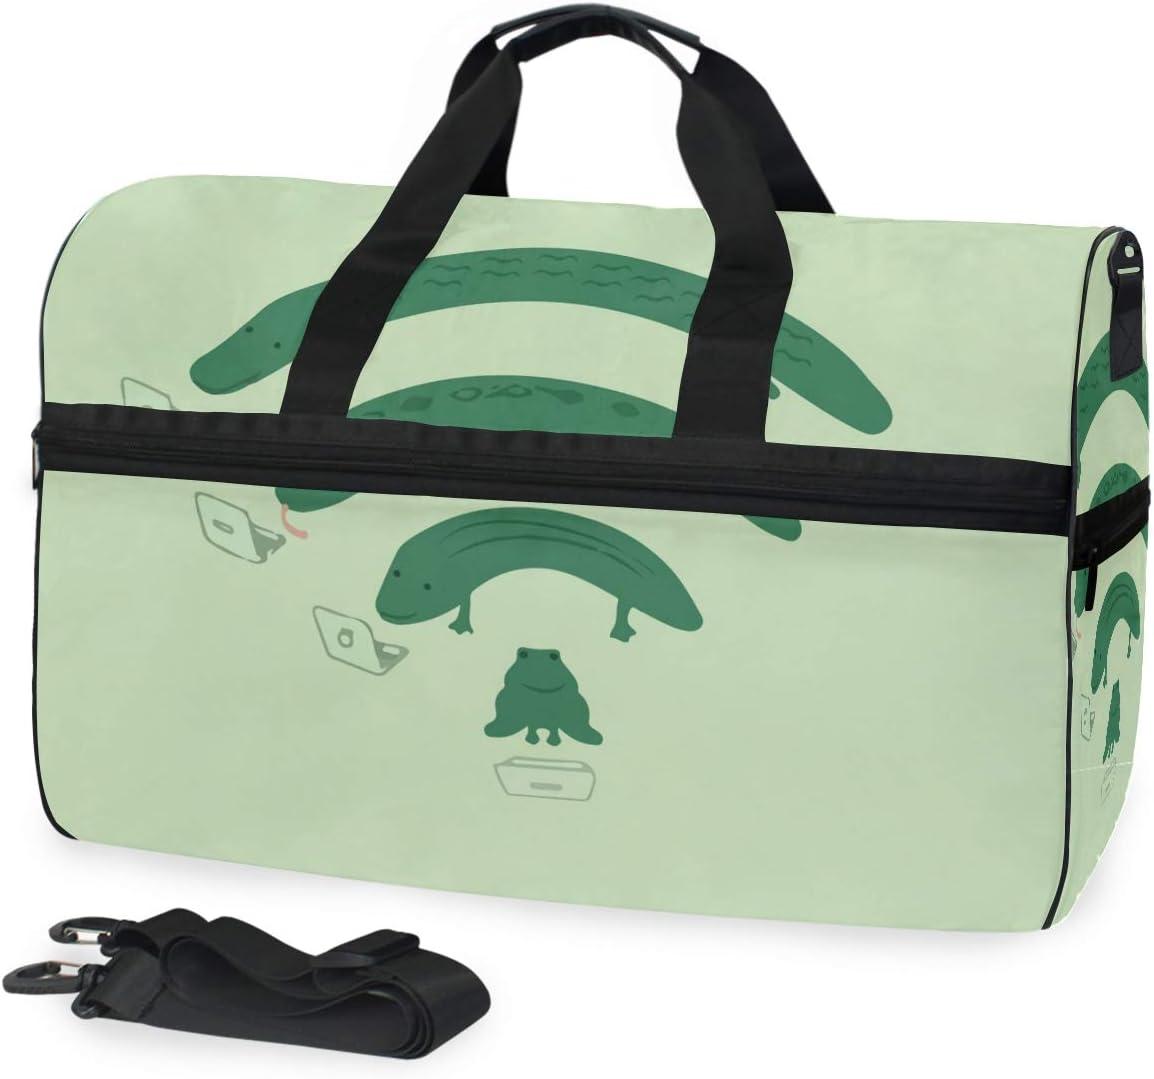 FAJRO Duffle Bag for Women Men Frog Wifi Travel Duffel Bag Large Size Water-proof Tear Resistant